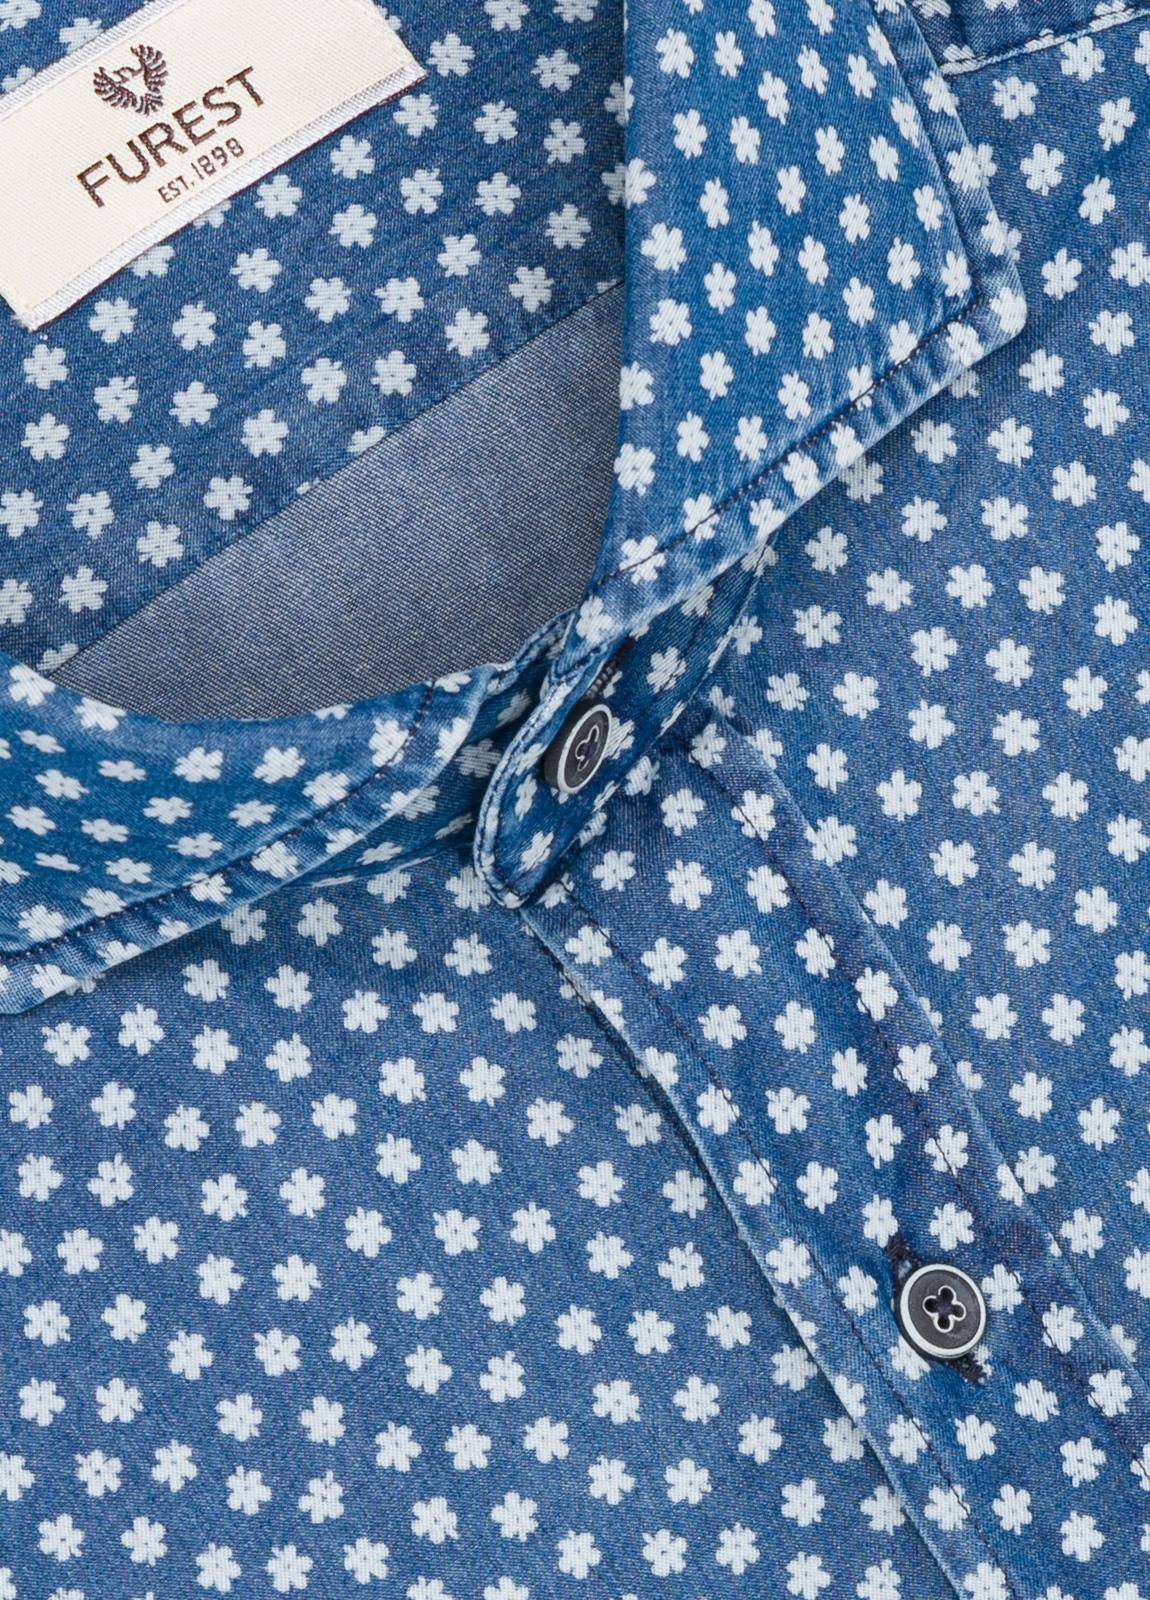 Camisa Leisure Wear SLIM FIT modelo CAPRI estampado flores color azul denim. 100% Algodón. - Ítem1